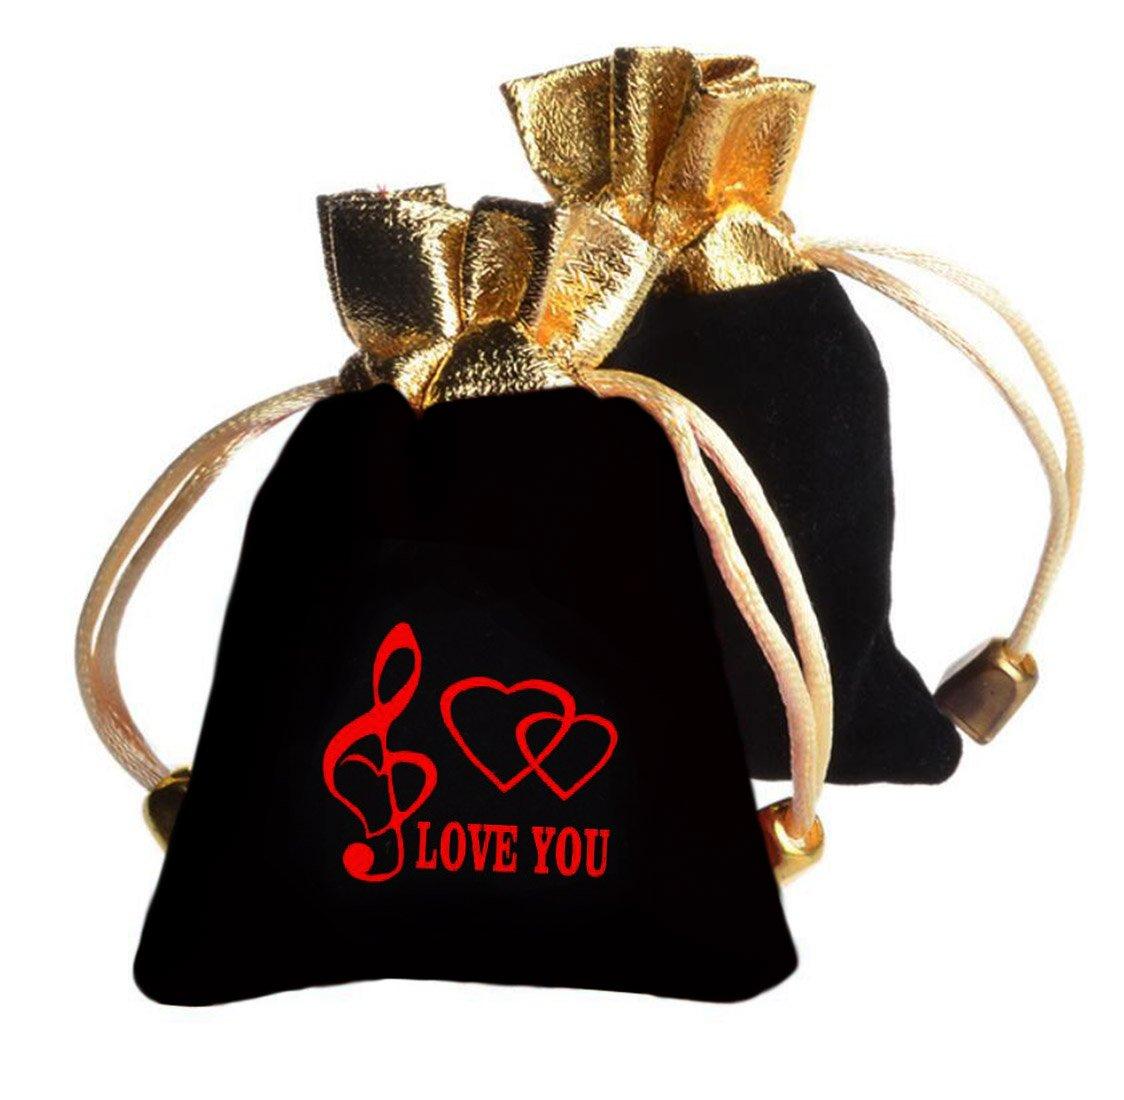 Cute Fox Rhinestone Keychain Bling Keyring Women Bag Purse Charm Pendant Gift by leomoste (Image #6)